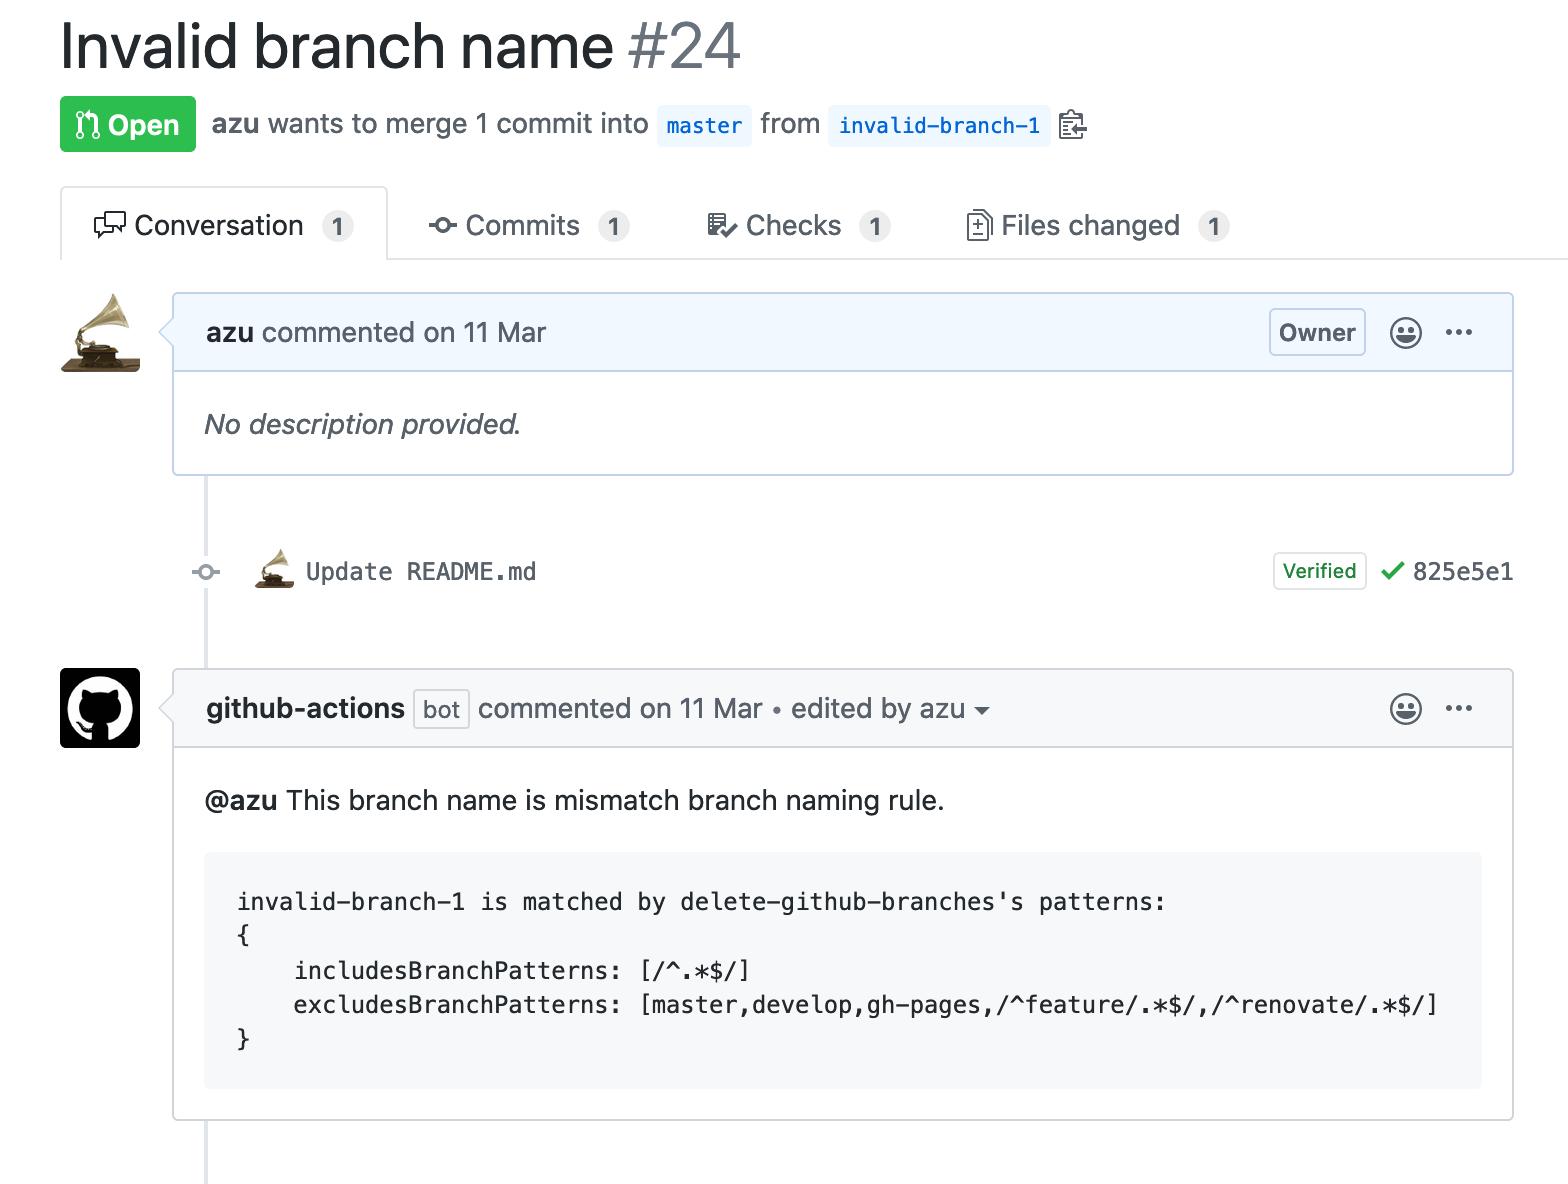 mismatch branch